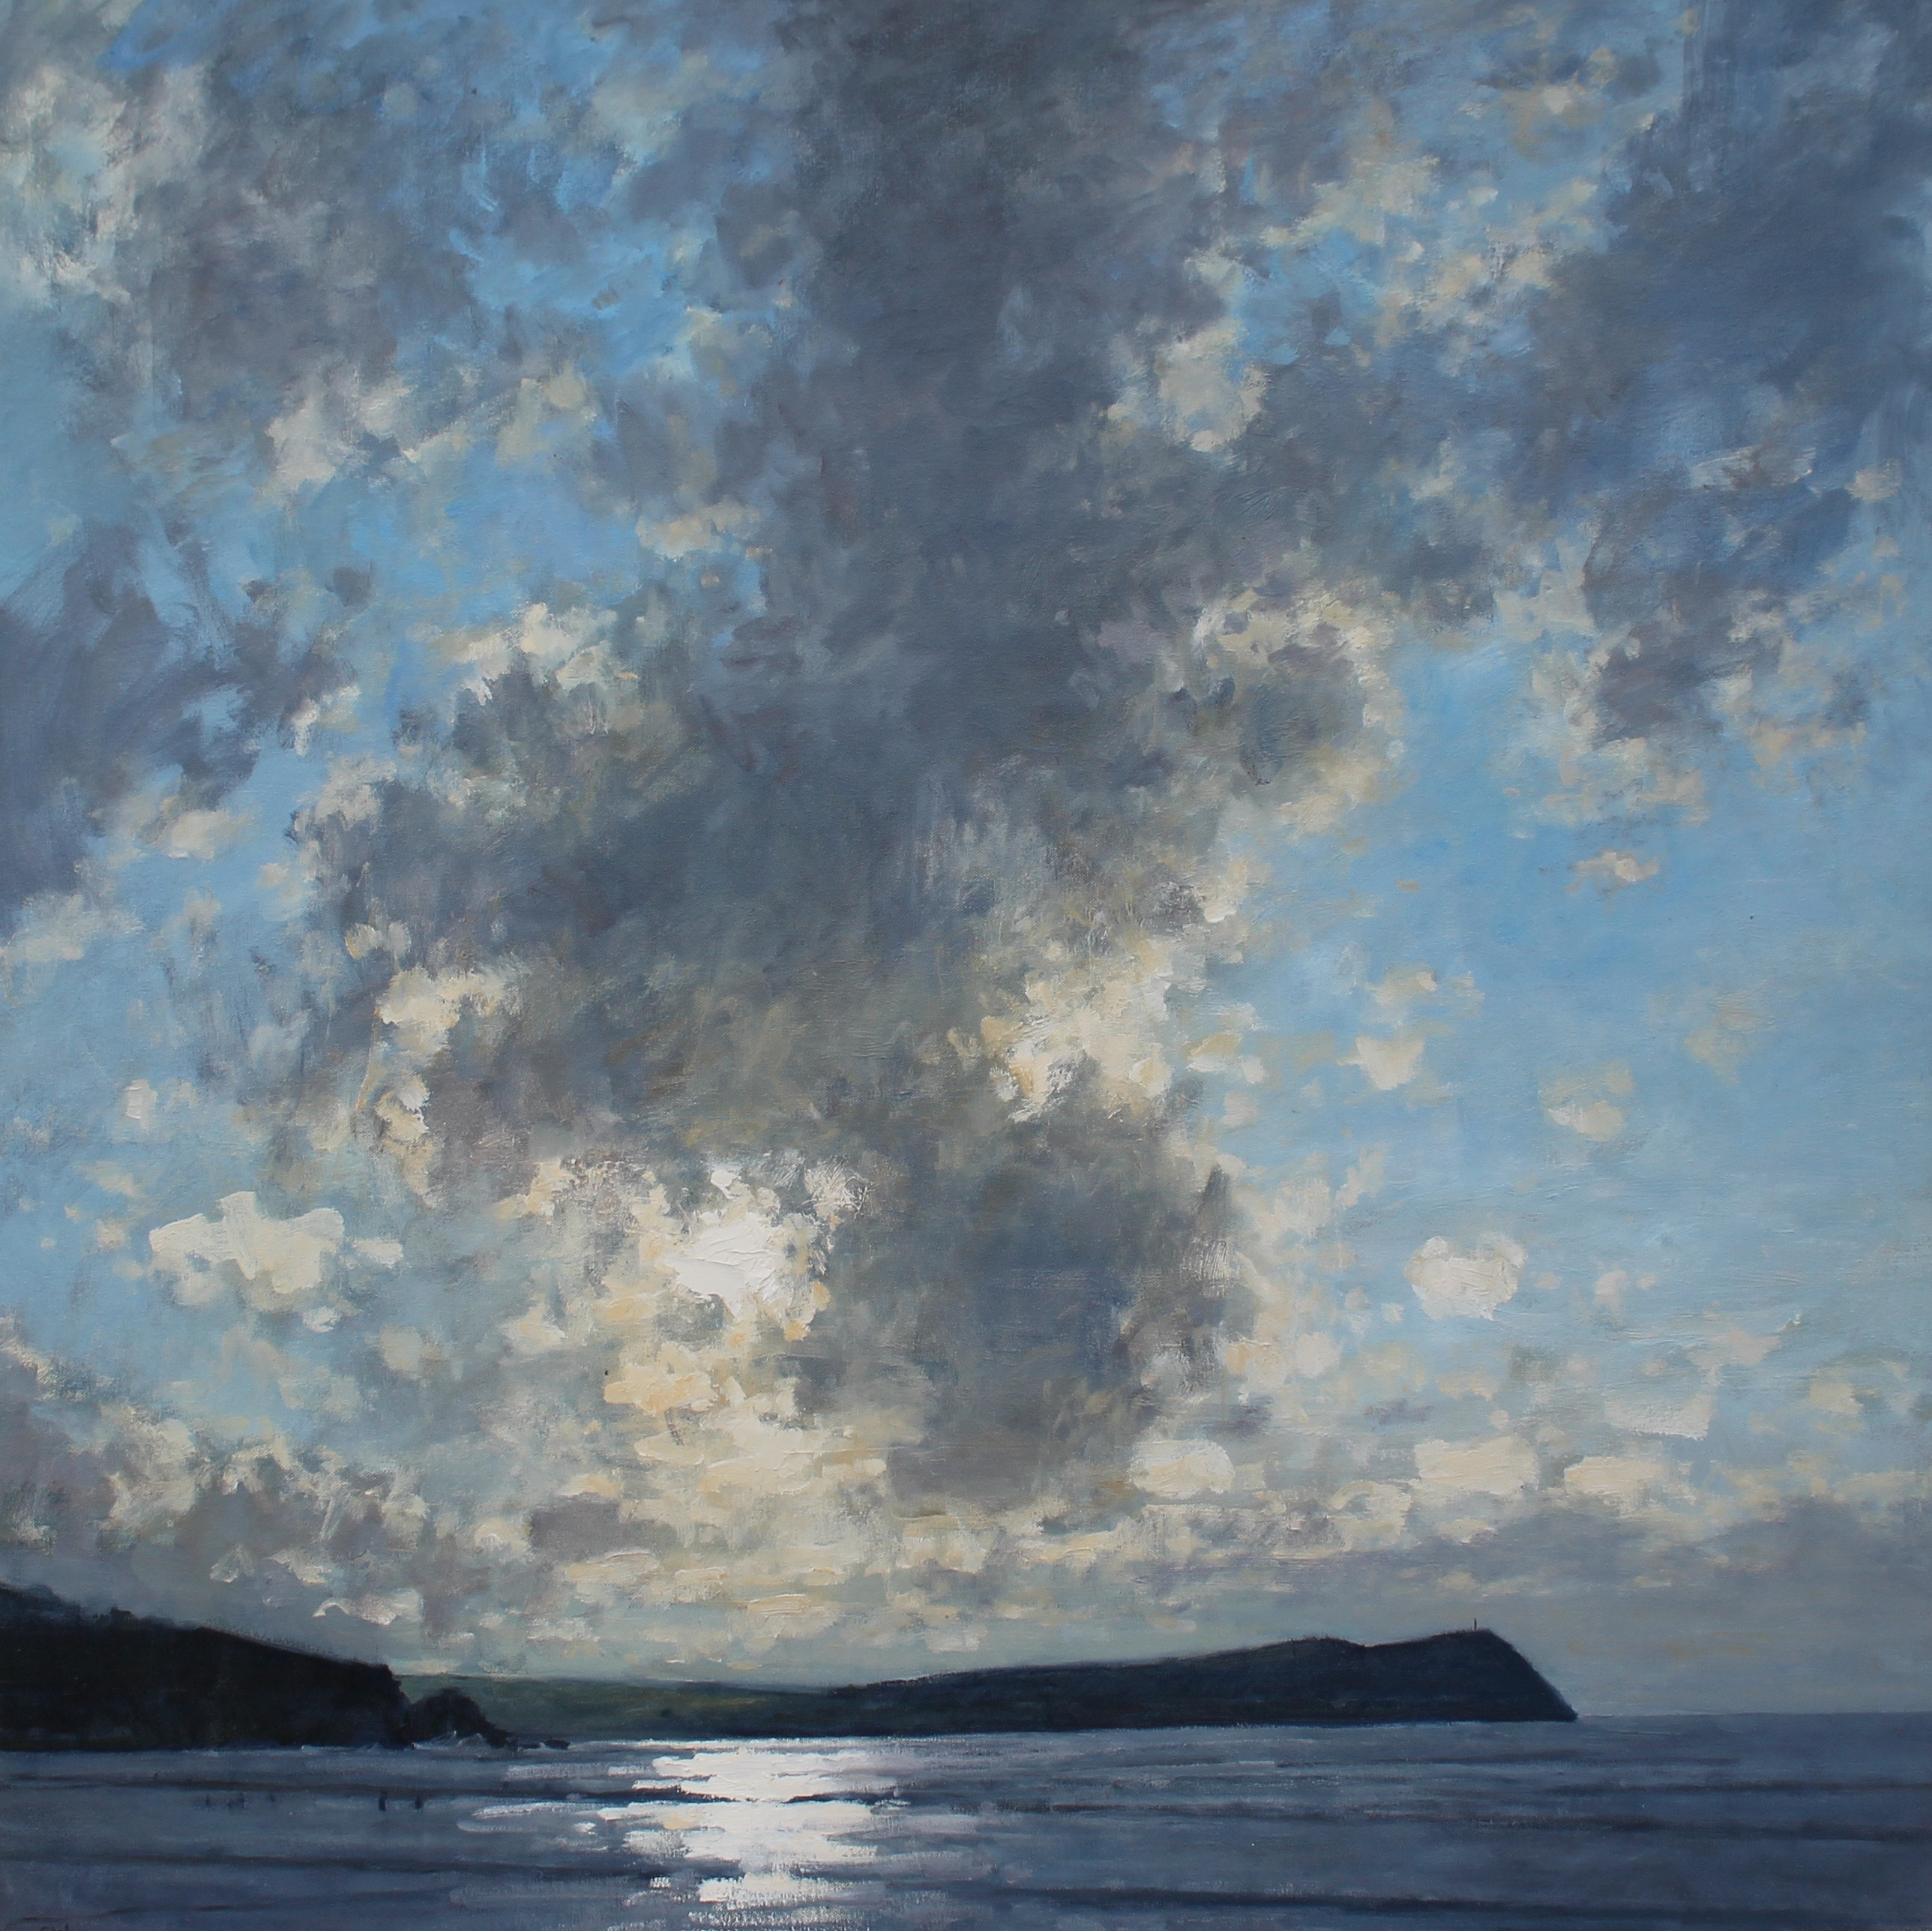 Sun Behind the Clouds, Polzeath